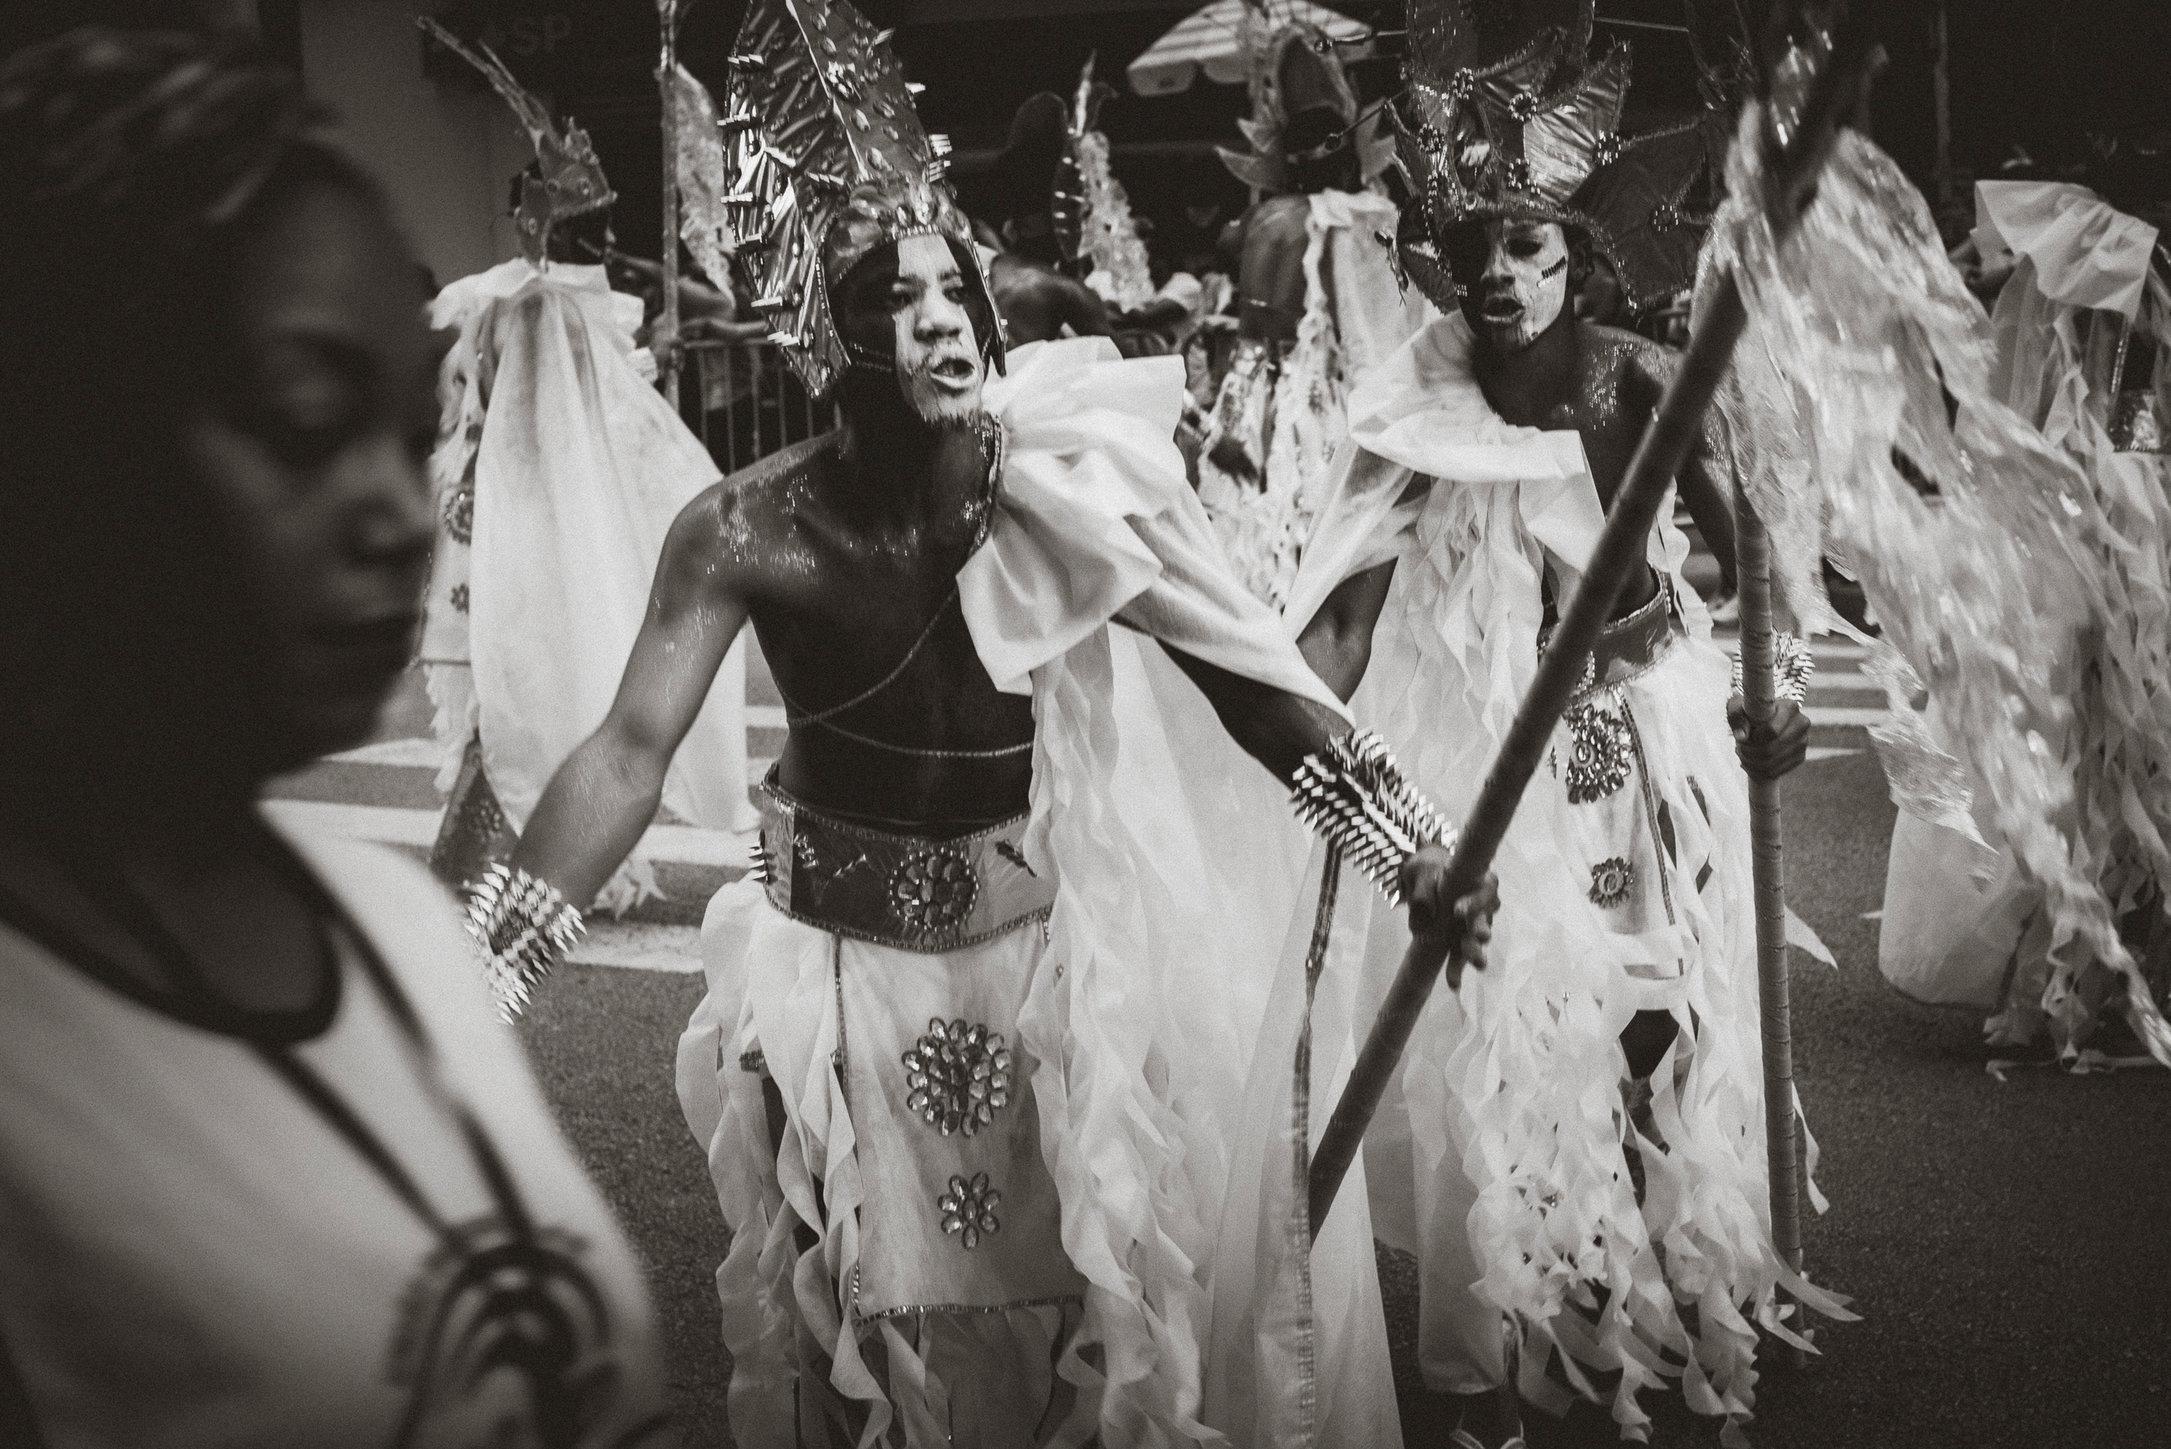 20180211-Carnaval-23.jpg